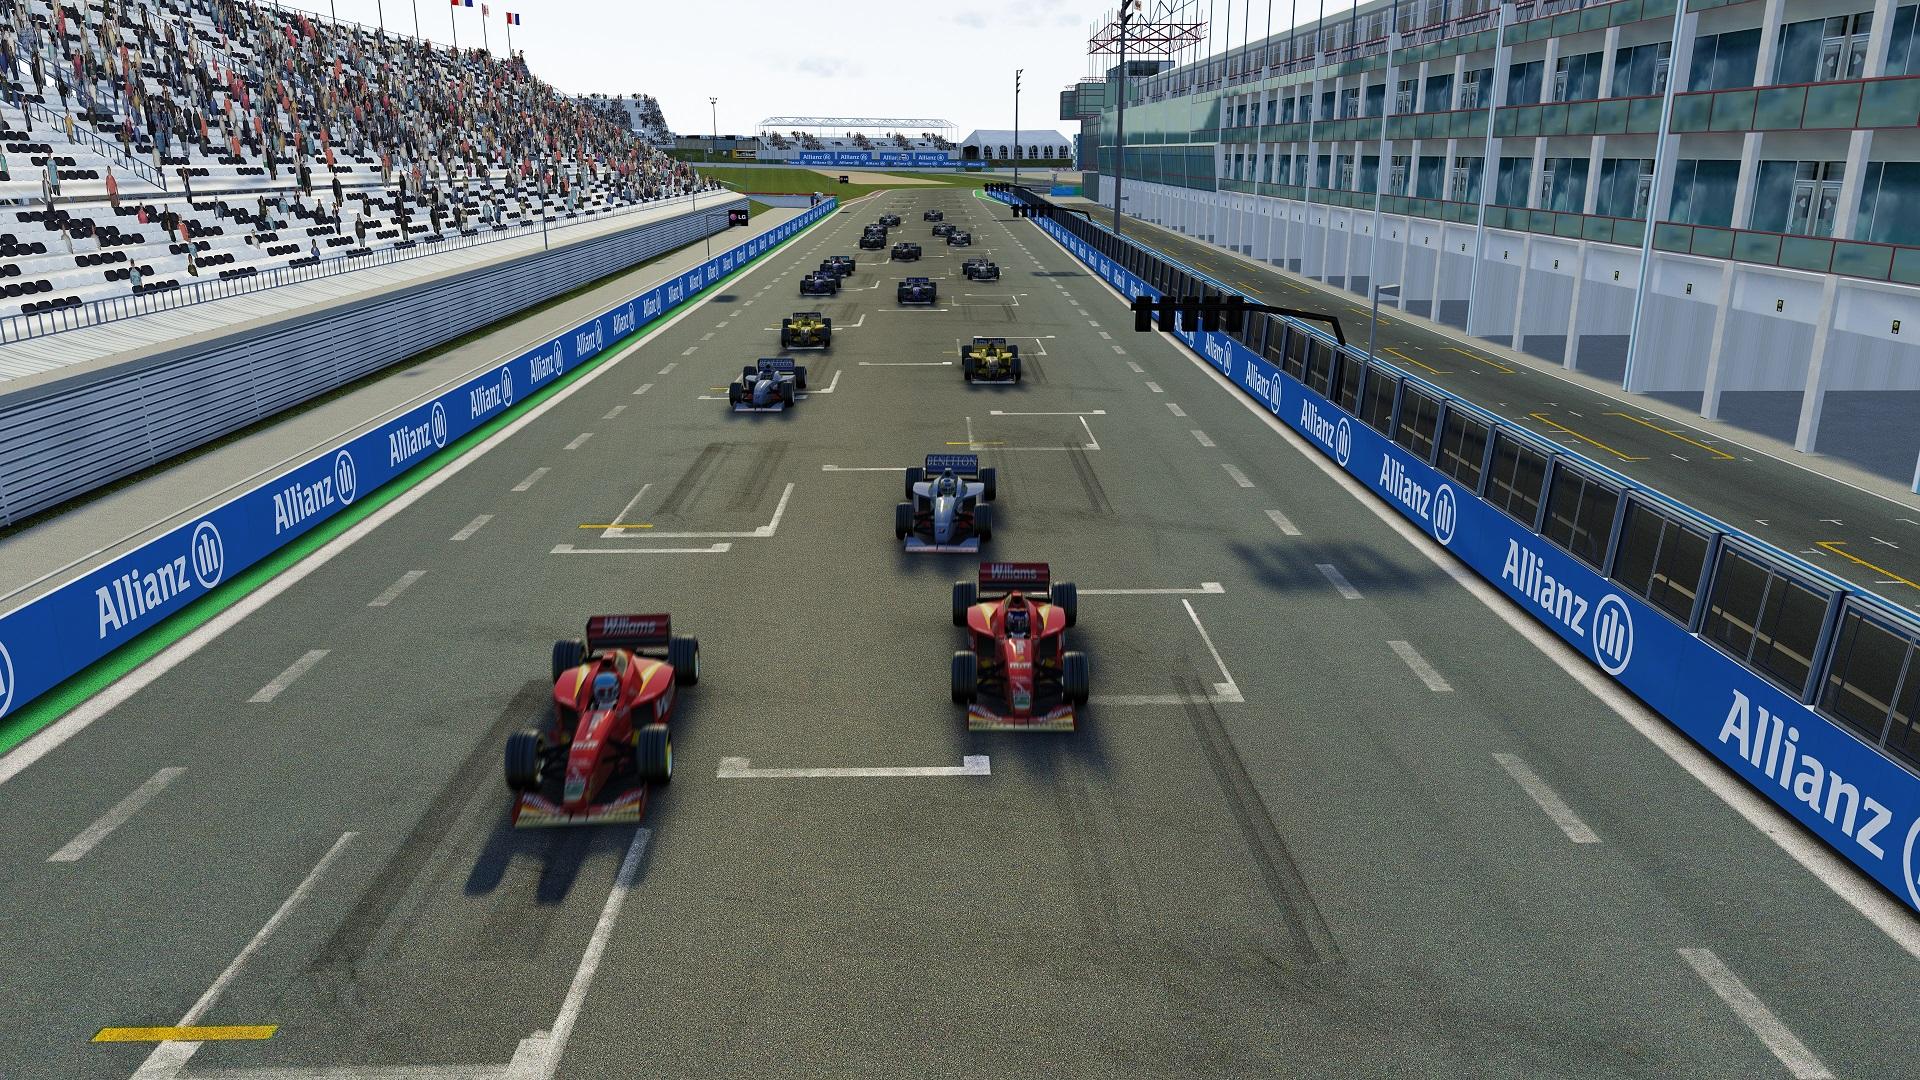 Screenshot_grand_prix_racer_magny-cours_1-11-120-15-10-21.jpg